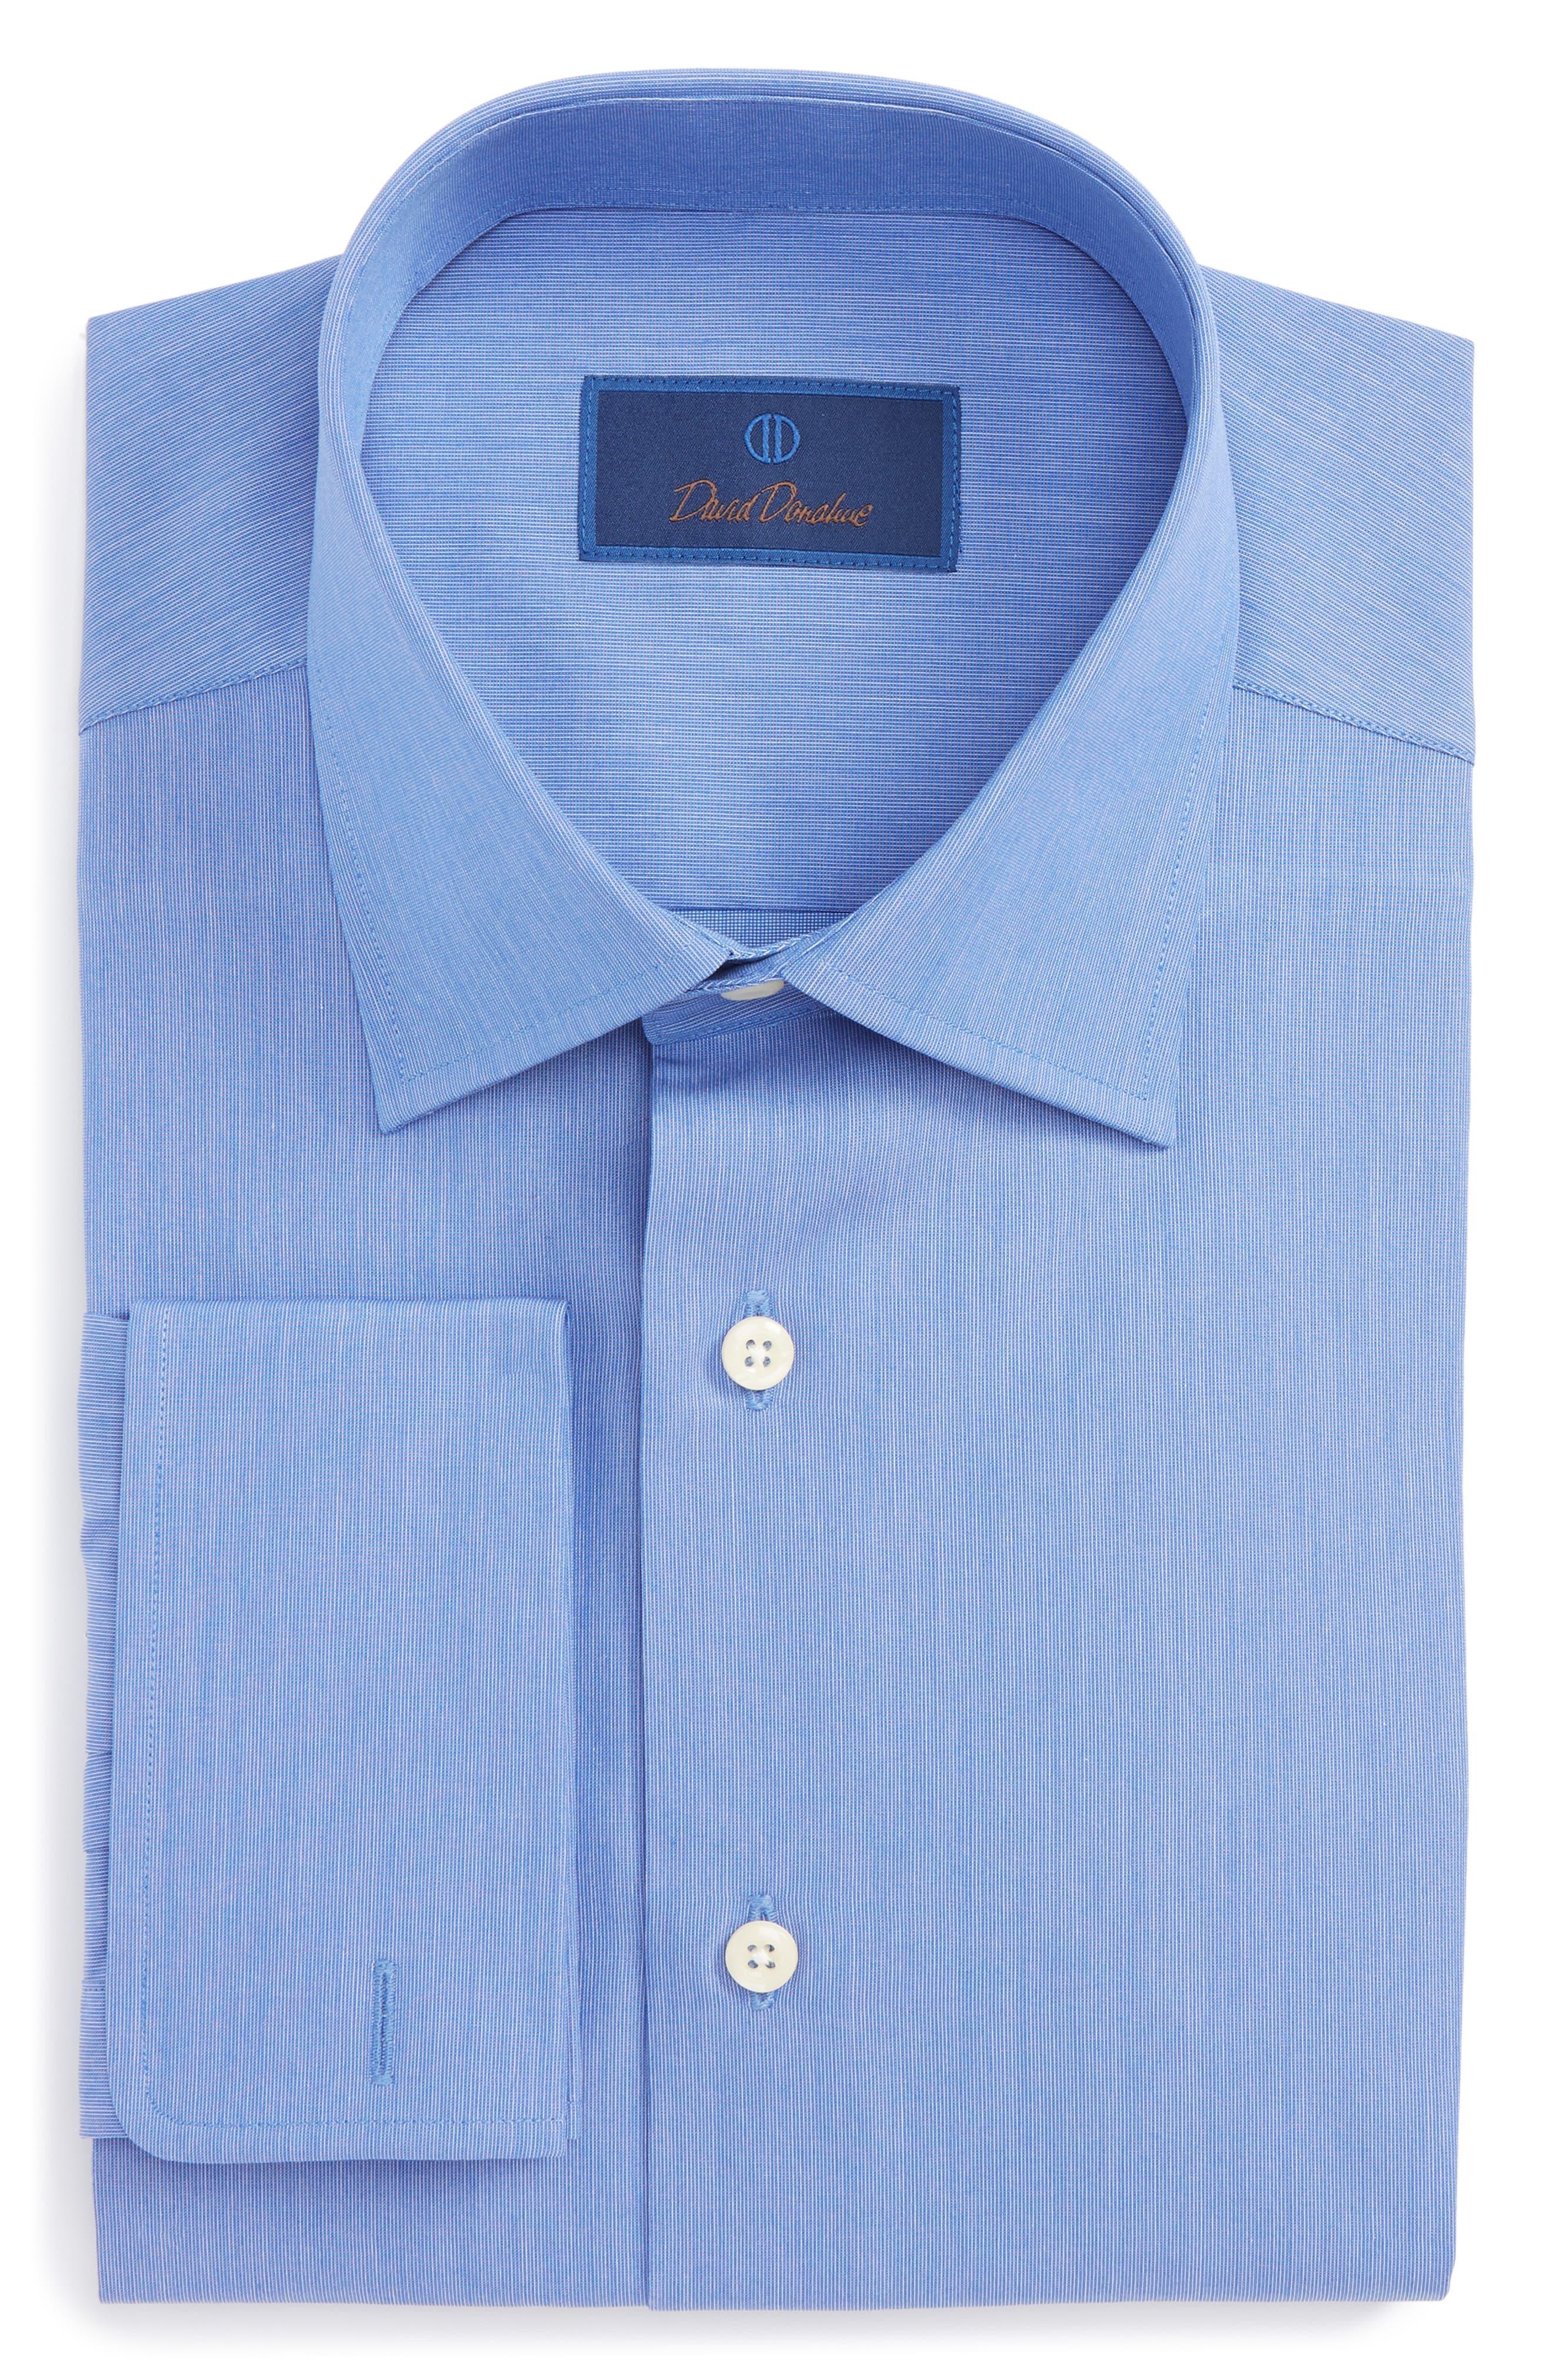 Alternate Image 1 Selected - David Donahue Regular Fit Solid Dress Shirt